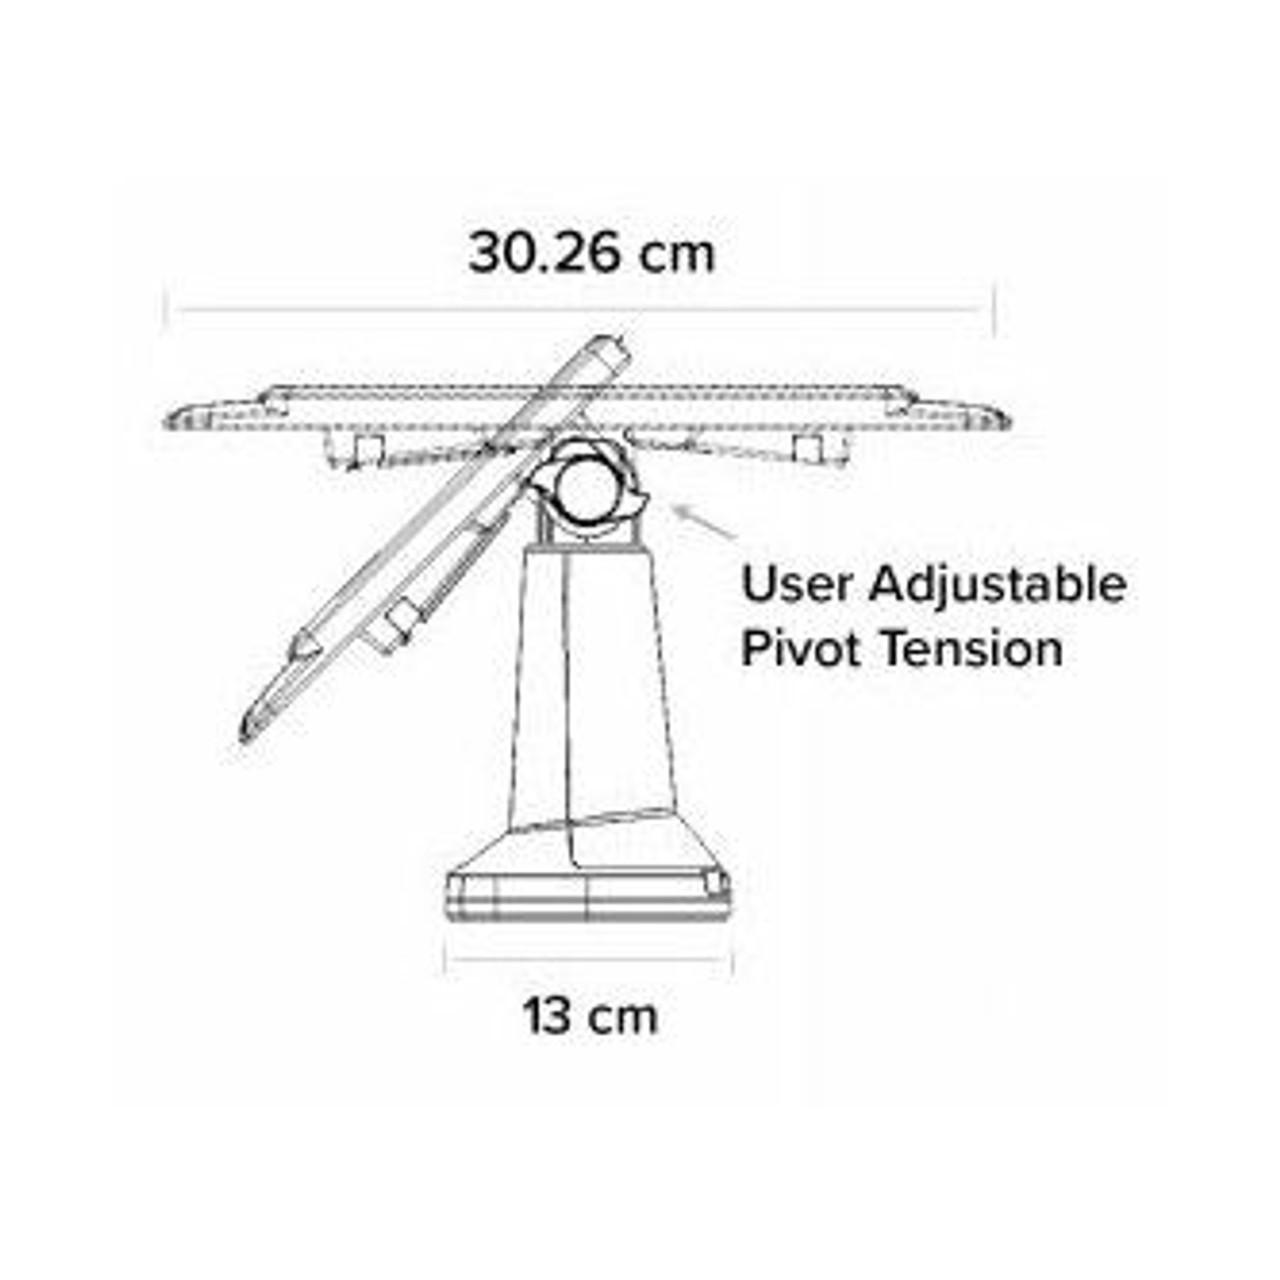 Ingenico Lane 3000 7000 8000 Tailwind FlexiPole Plus Stand